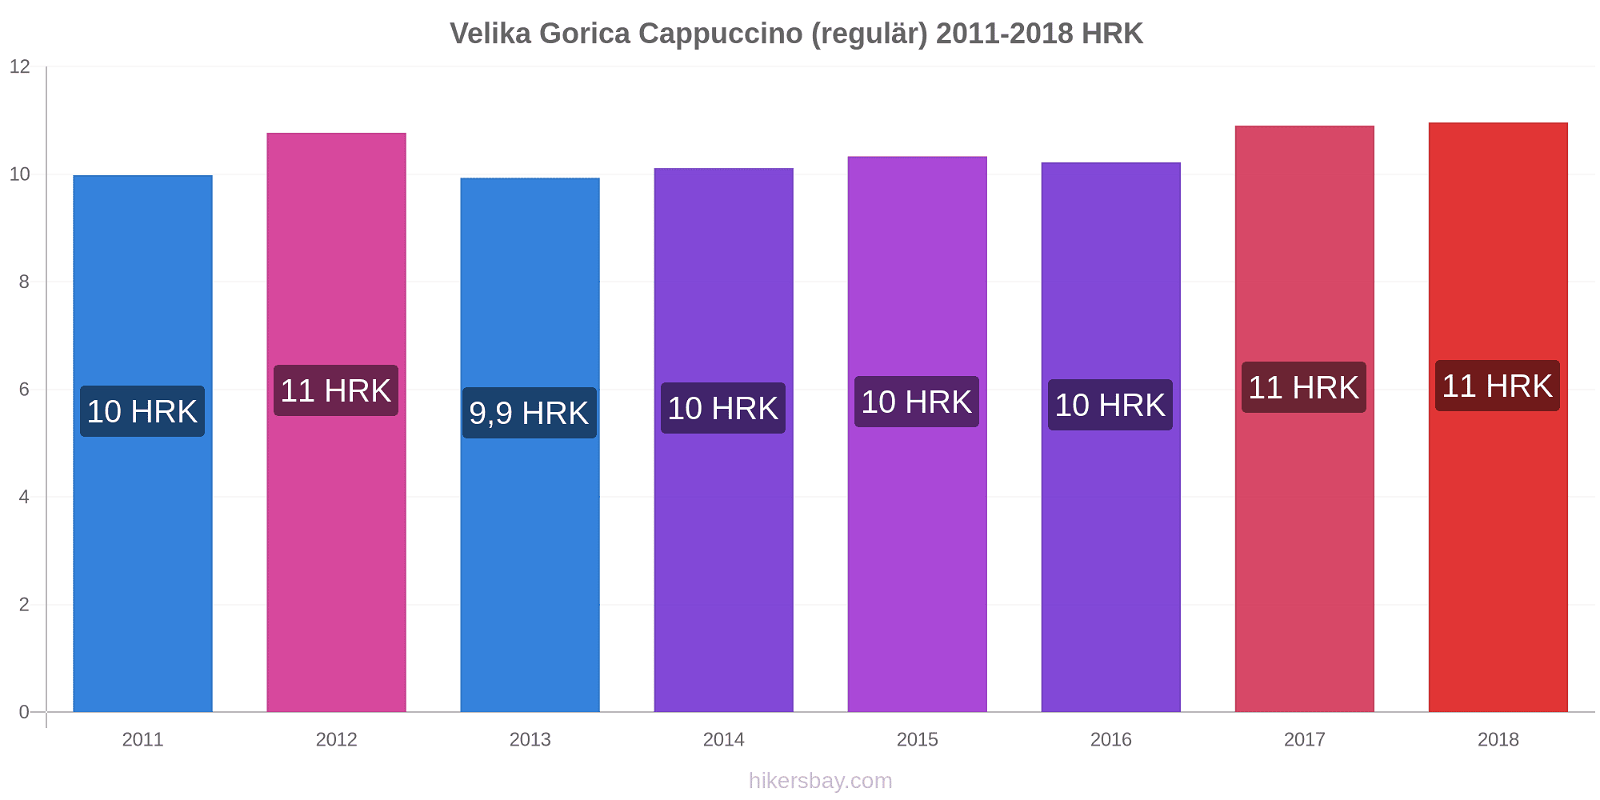 Velika Gorica Preisänderungen Cappuccino (regulär) hikersbay.com